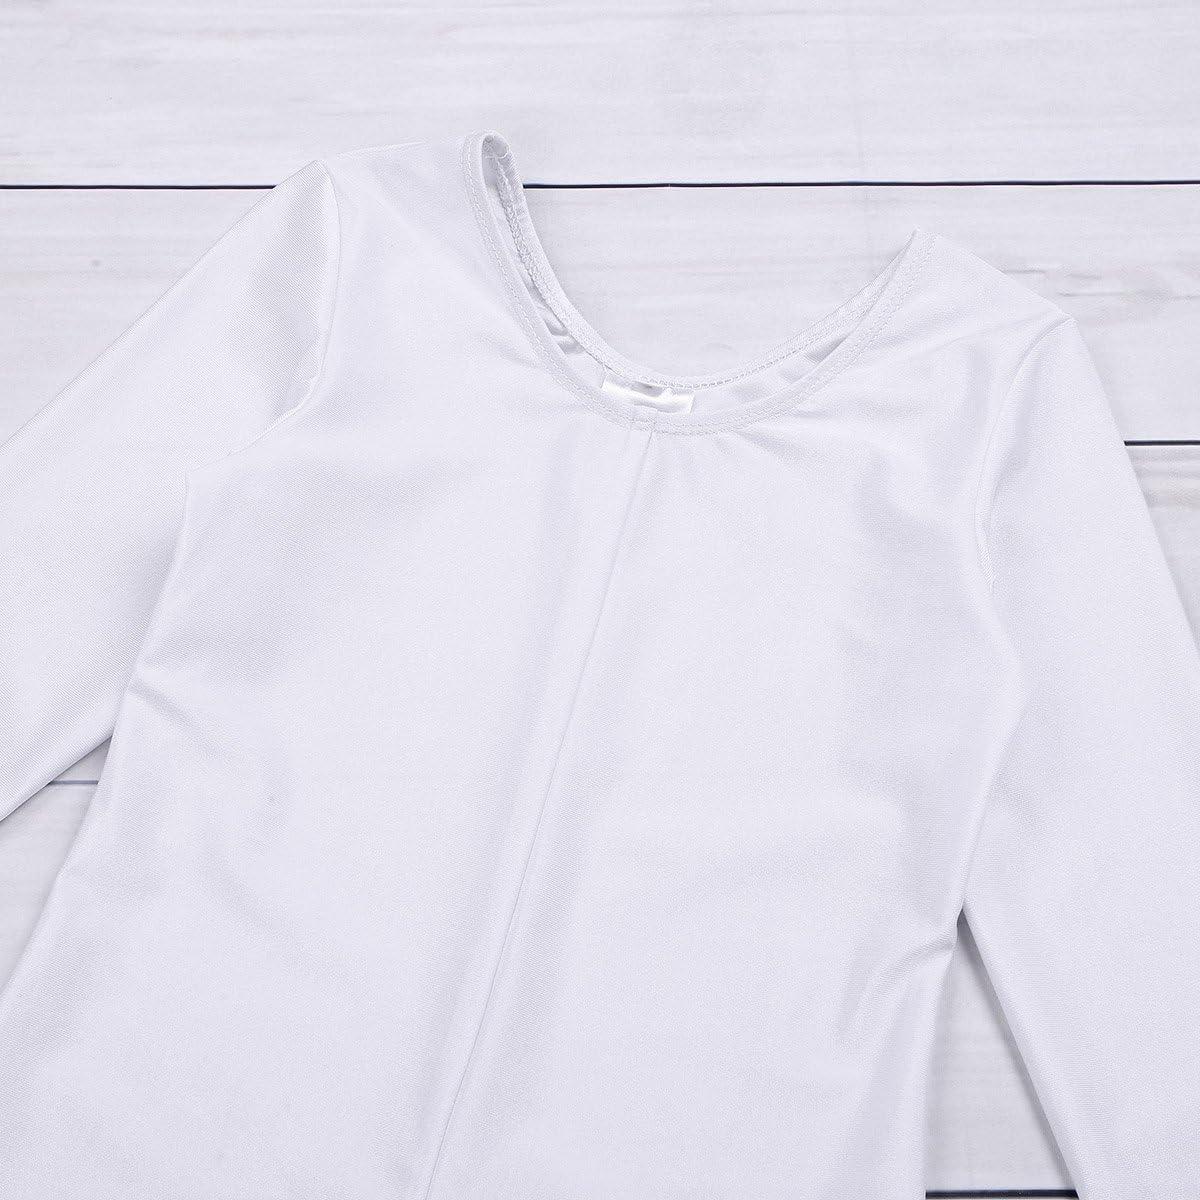 iixpin Kids Girls Ballet Dance Full Length Gymnastics Jumpsuit Long Sleeves Unitard Bodysuit Dancewear